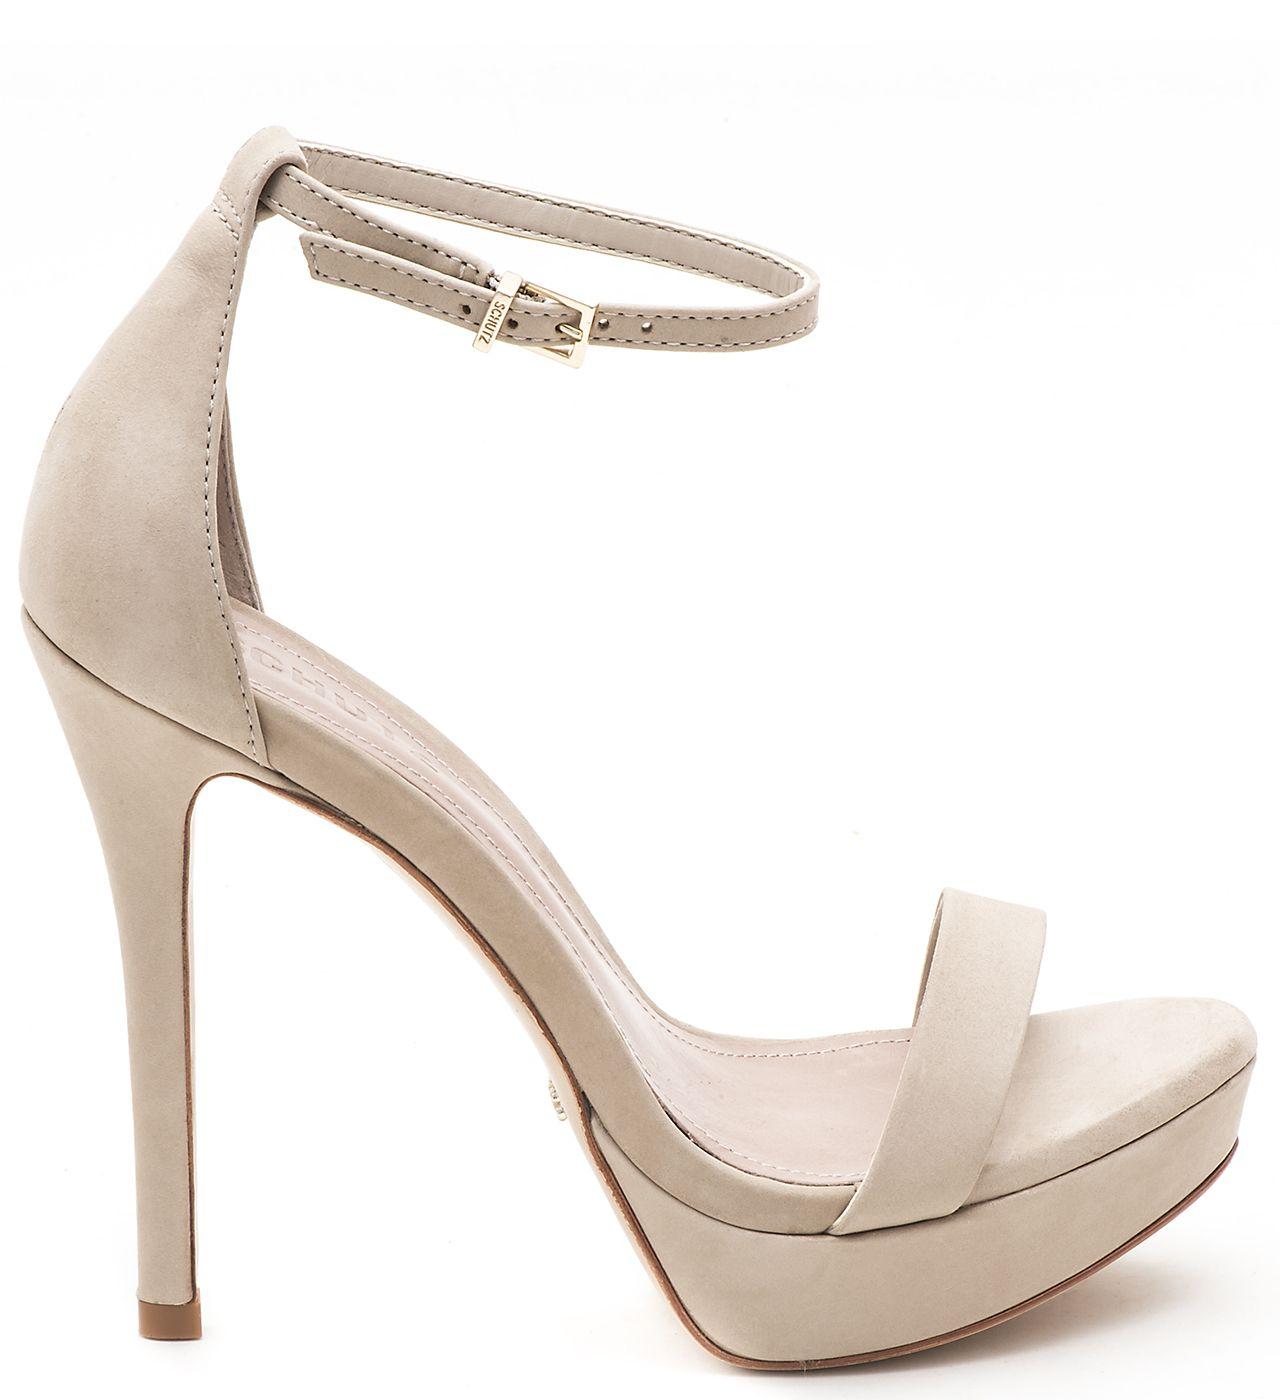 44ed672f6 SANDÁLIA SINGLE MEIA PATA OYSTER | Saltos, sapatilhas e sandálias ...